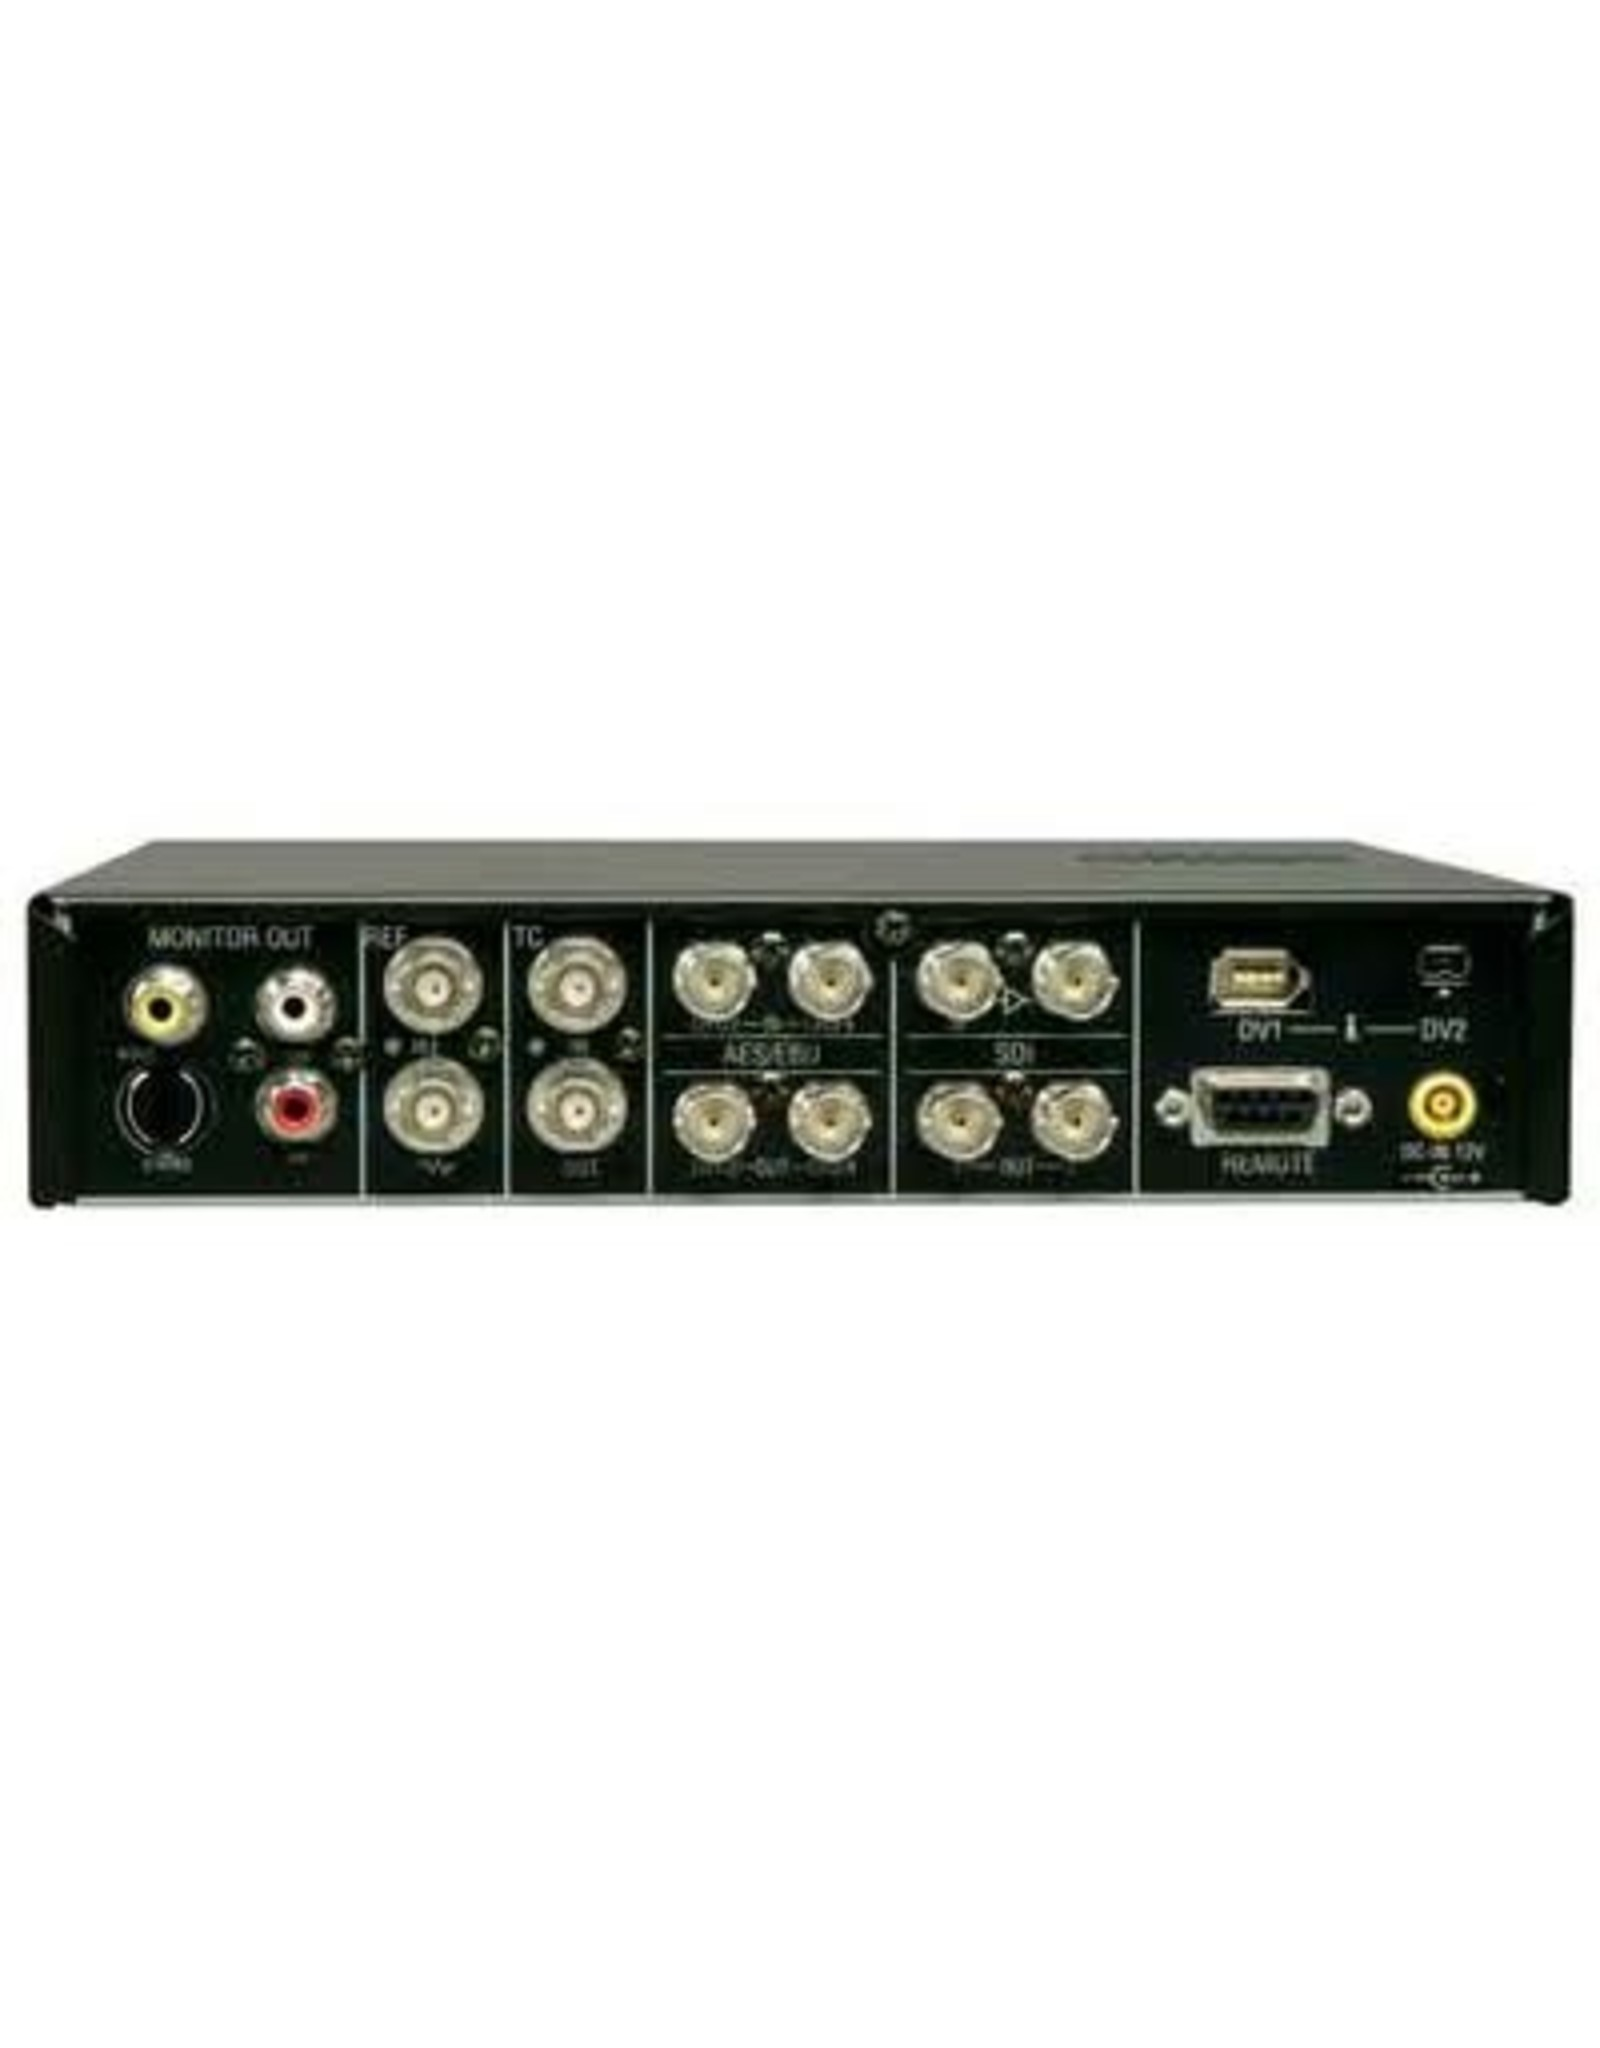 Grass Valley ADVC-1000 Converter